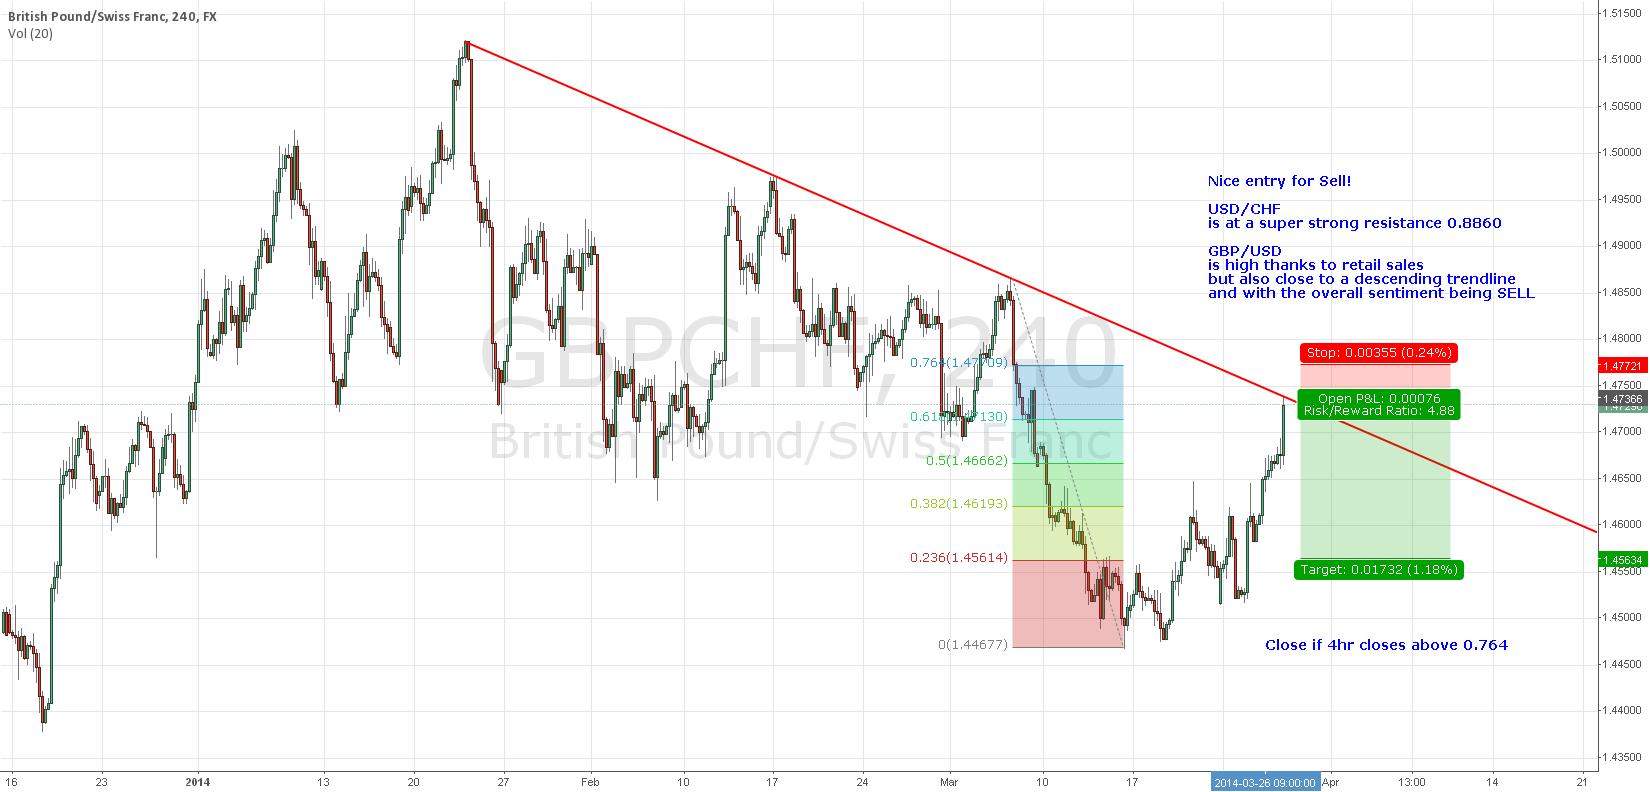 Strong descending trendling for short position